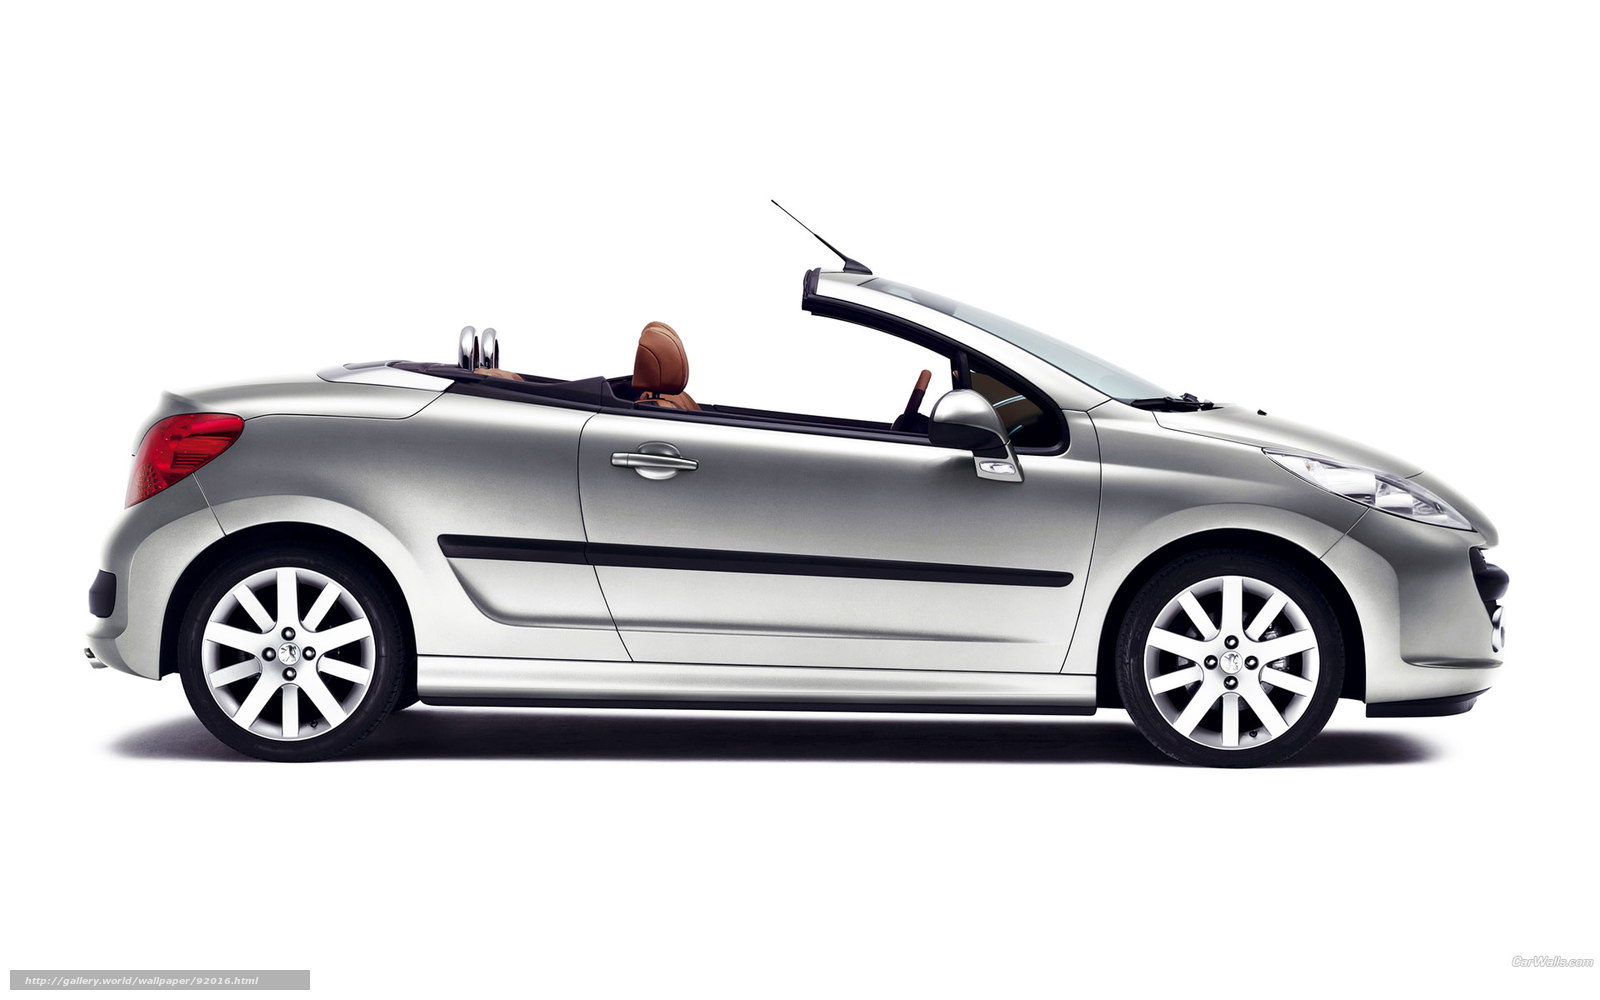 Download wallpaper Peugeot,  2012,  auto,  Machines free desktop wallpaper in the resolution 1920x1200 — picture №92016